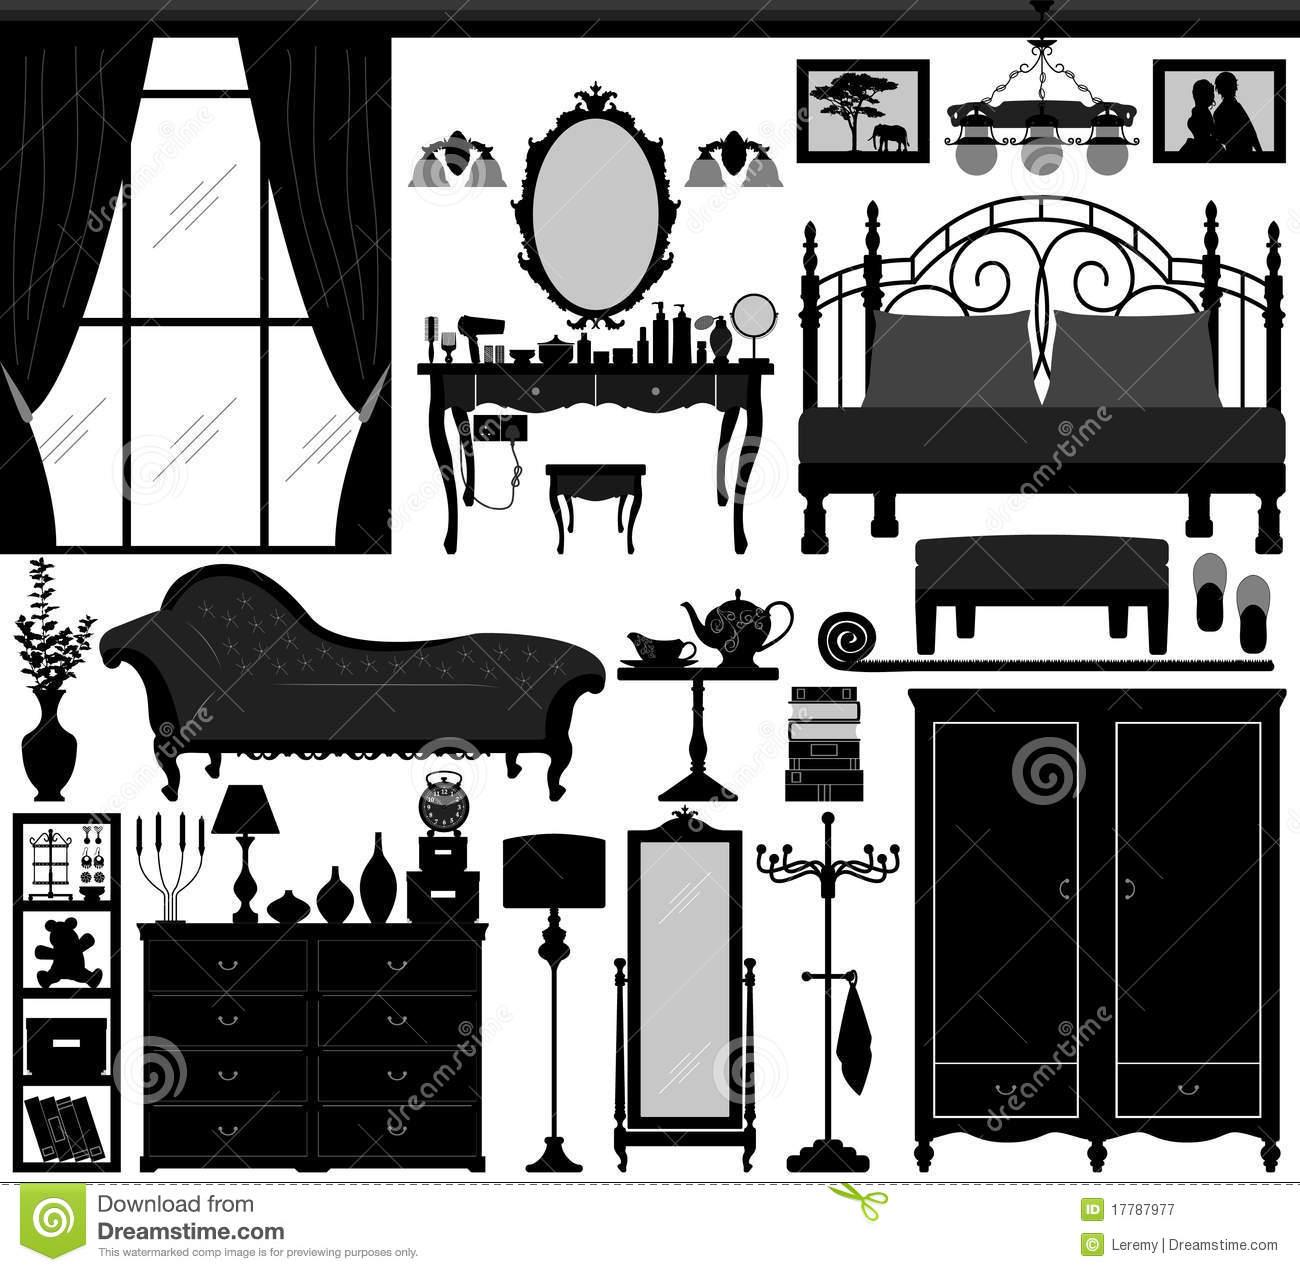 Furniture clipart interior decorator Set design Bedroom collection Furniture